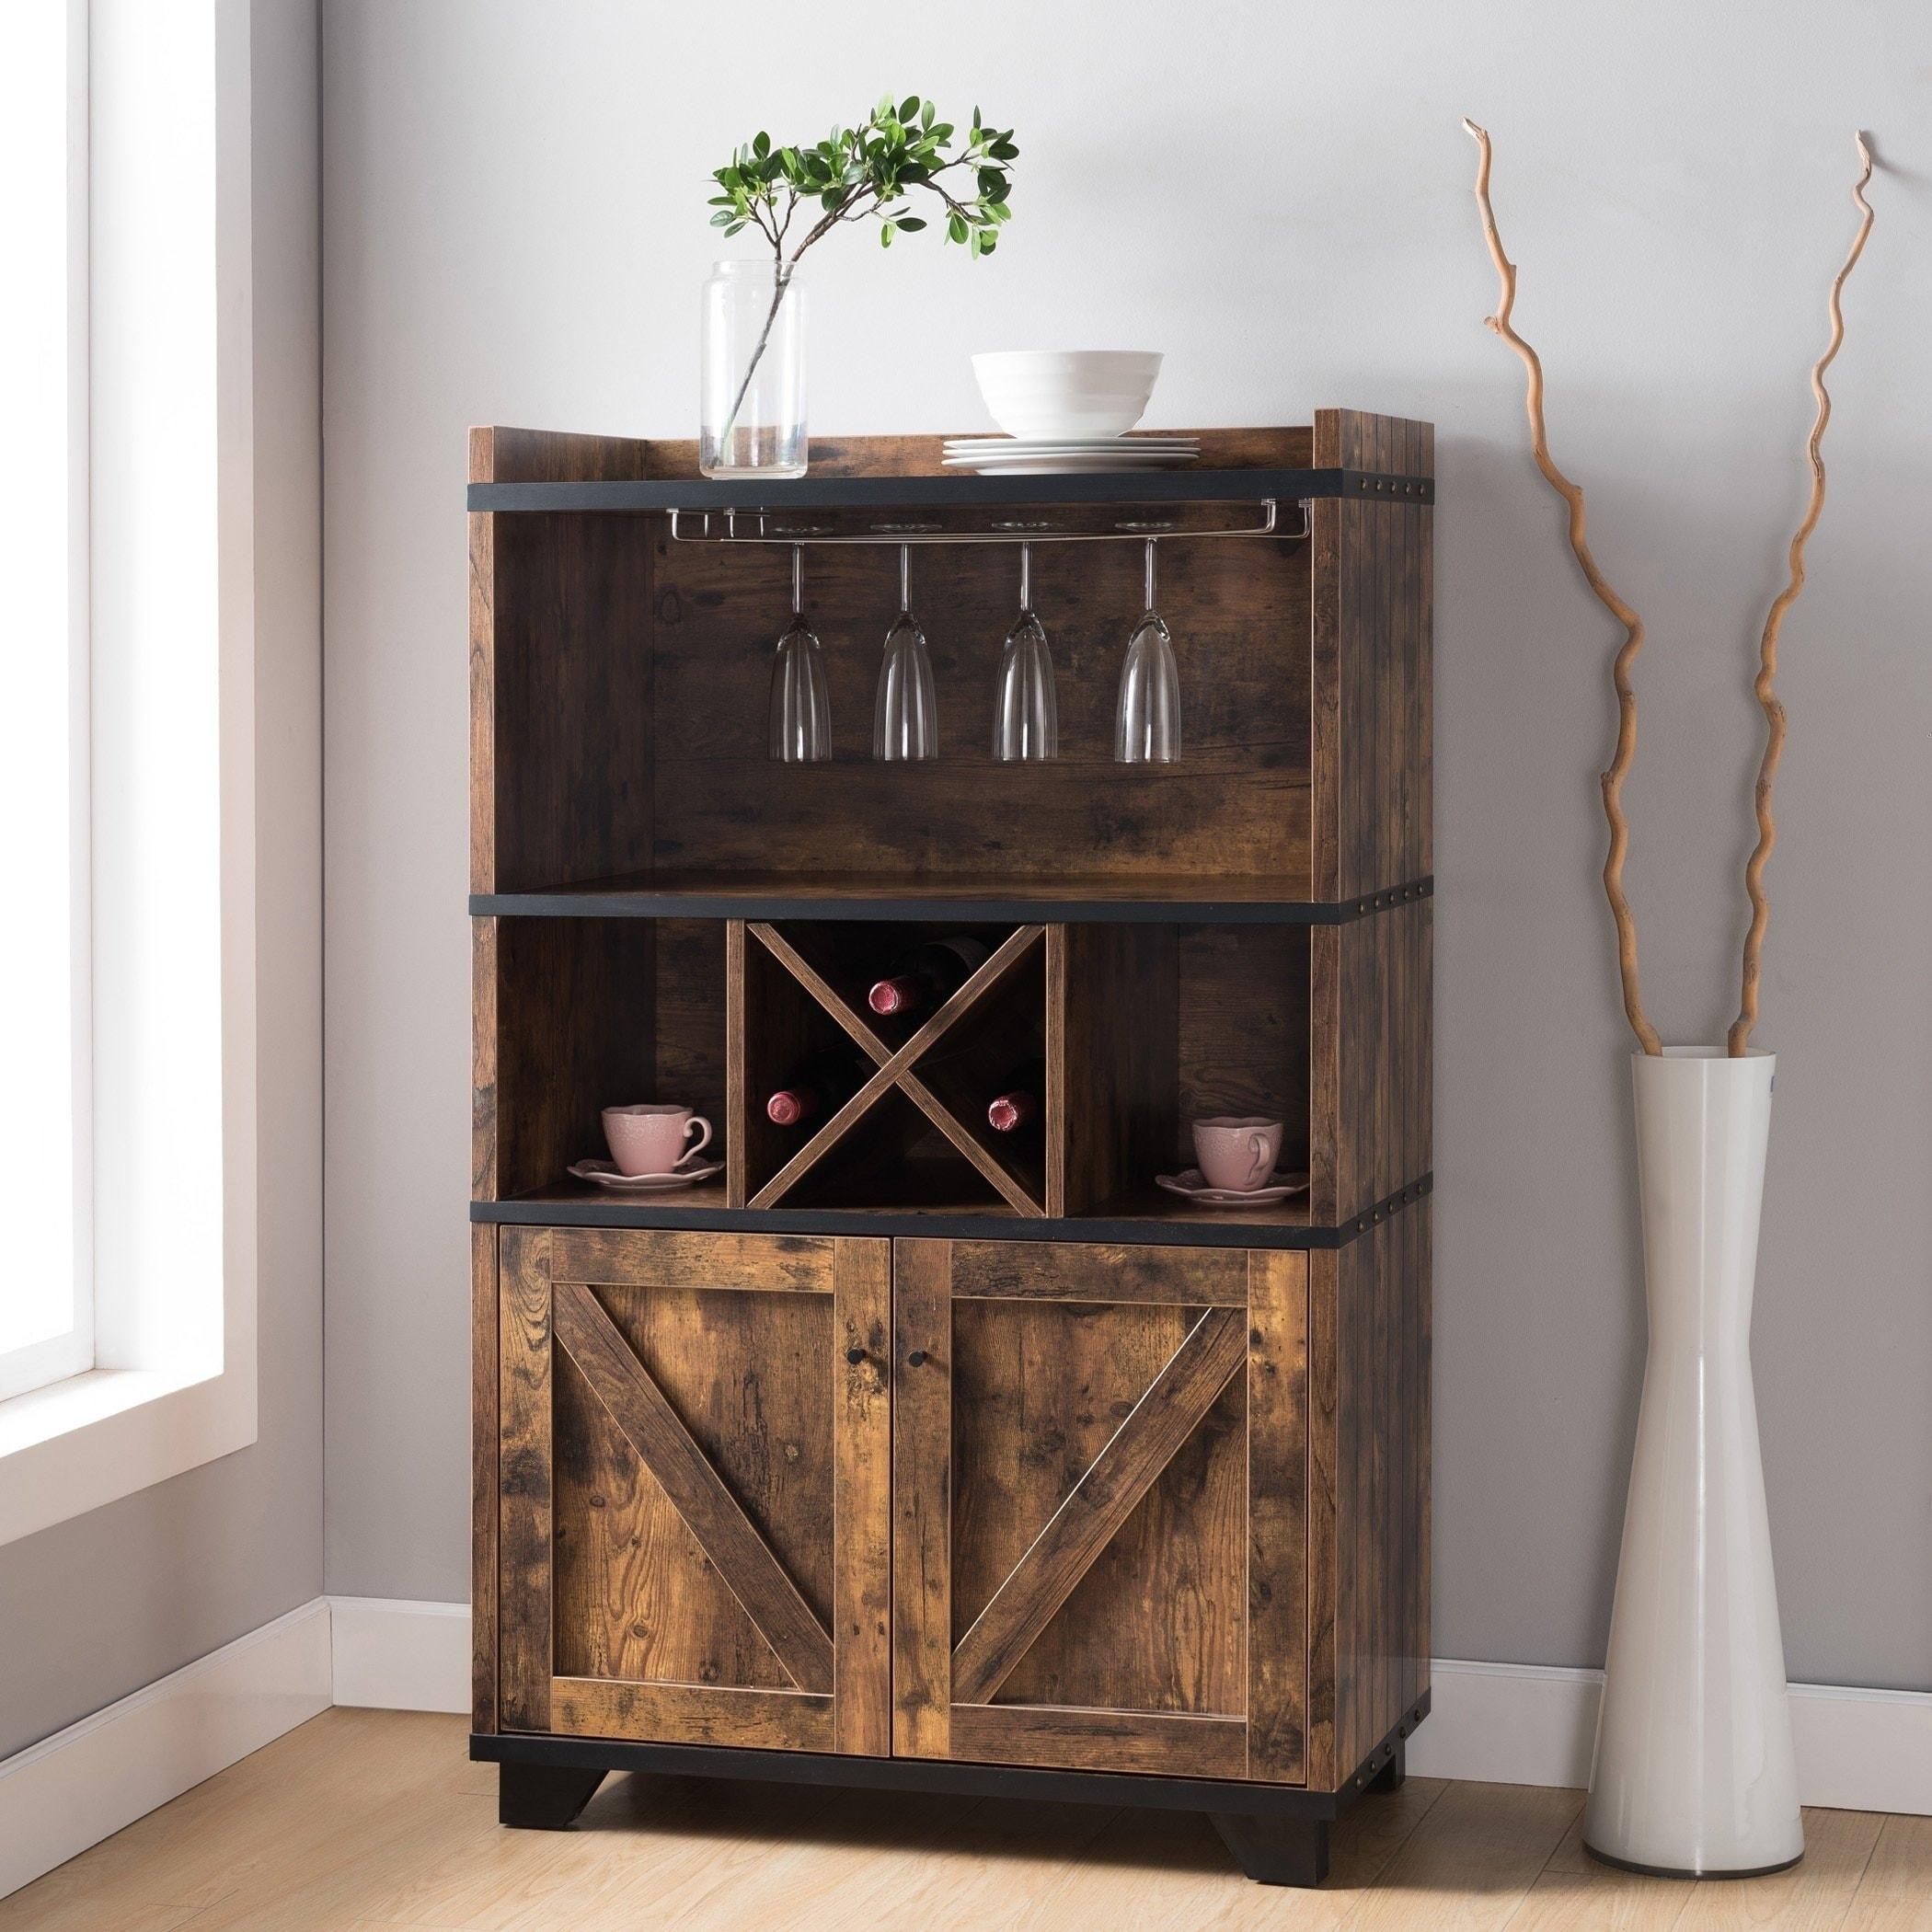 Shop Furniture Of America Wesleyan Rustic Farmhouse Wine Cabinet